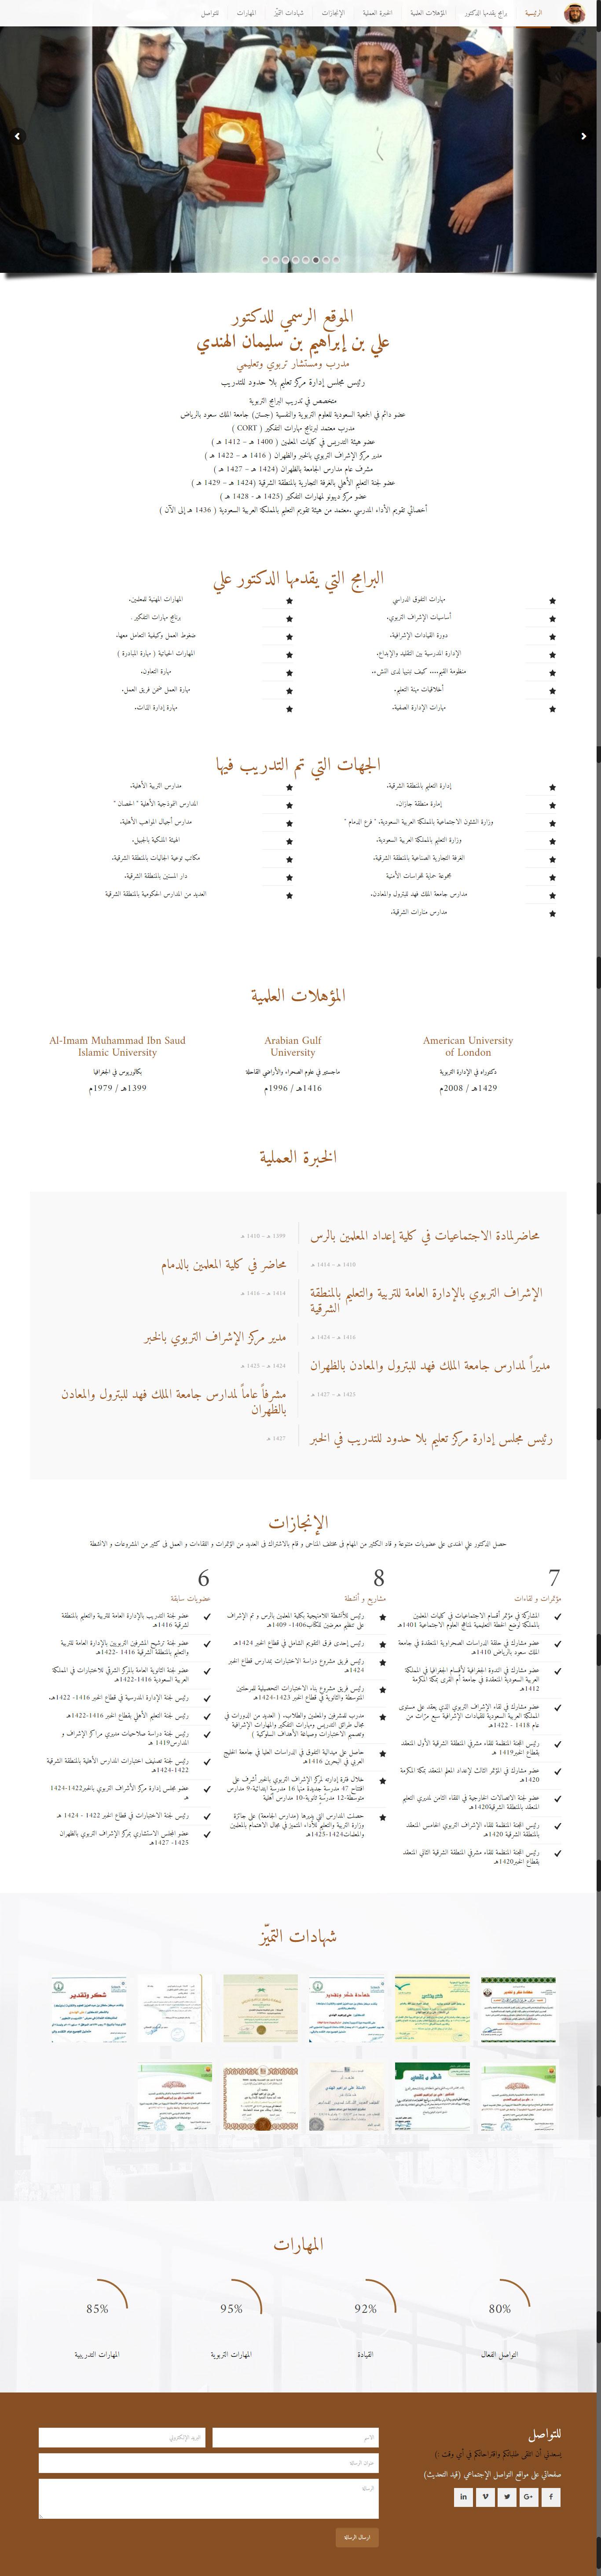 al-hendy-1479108197954